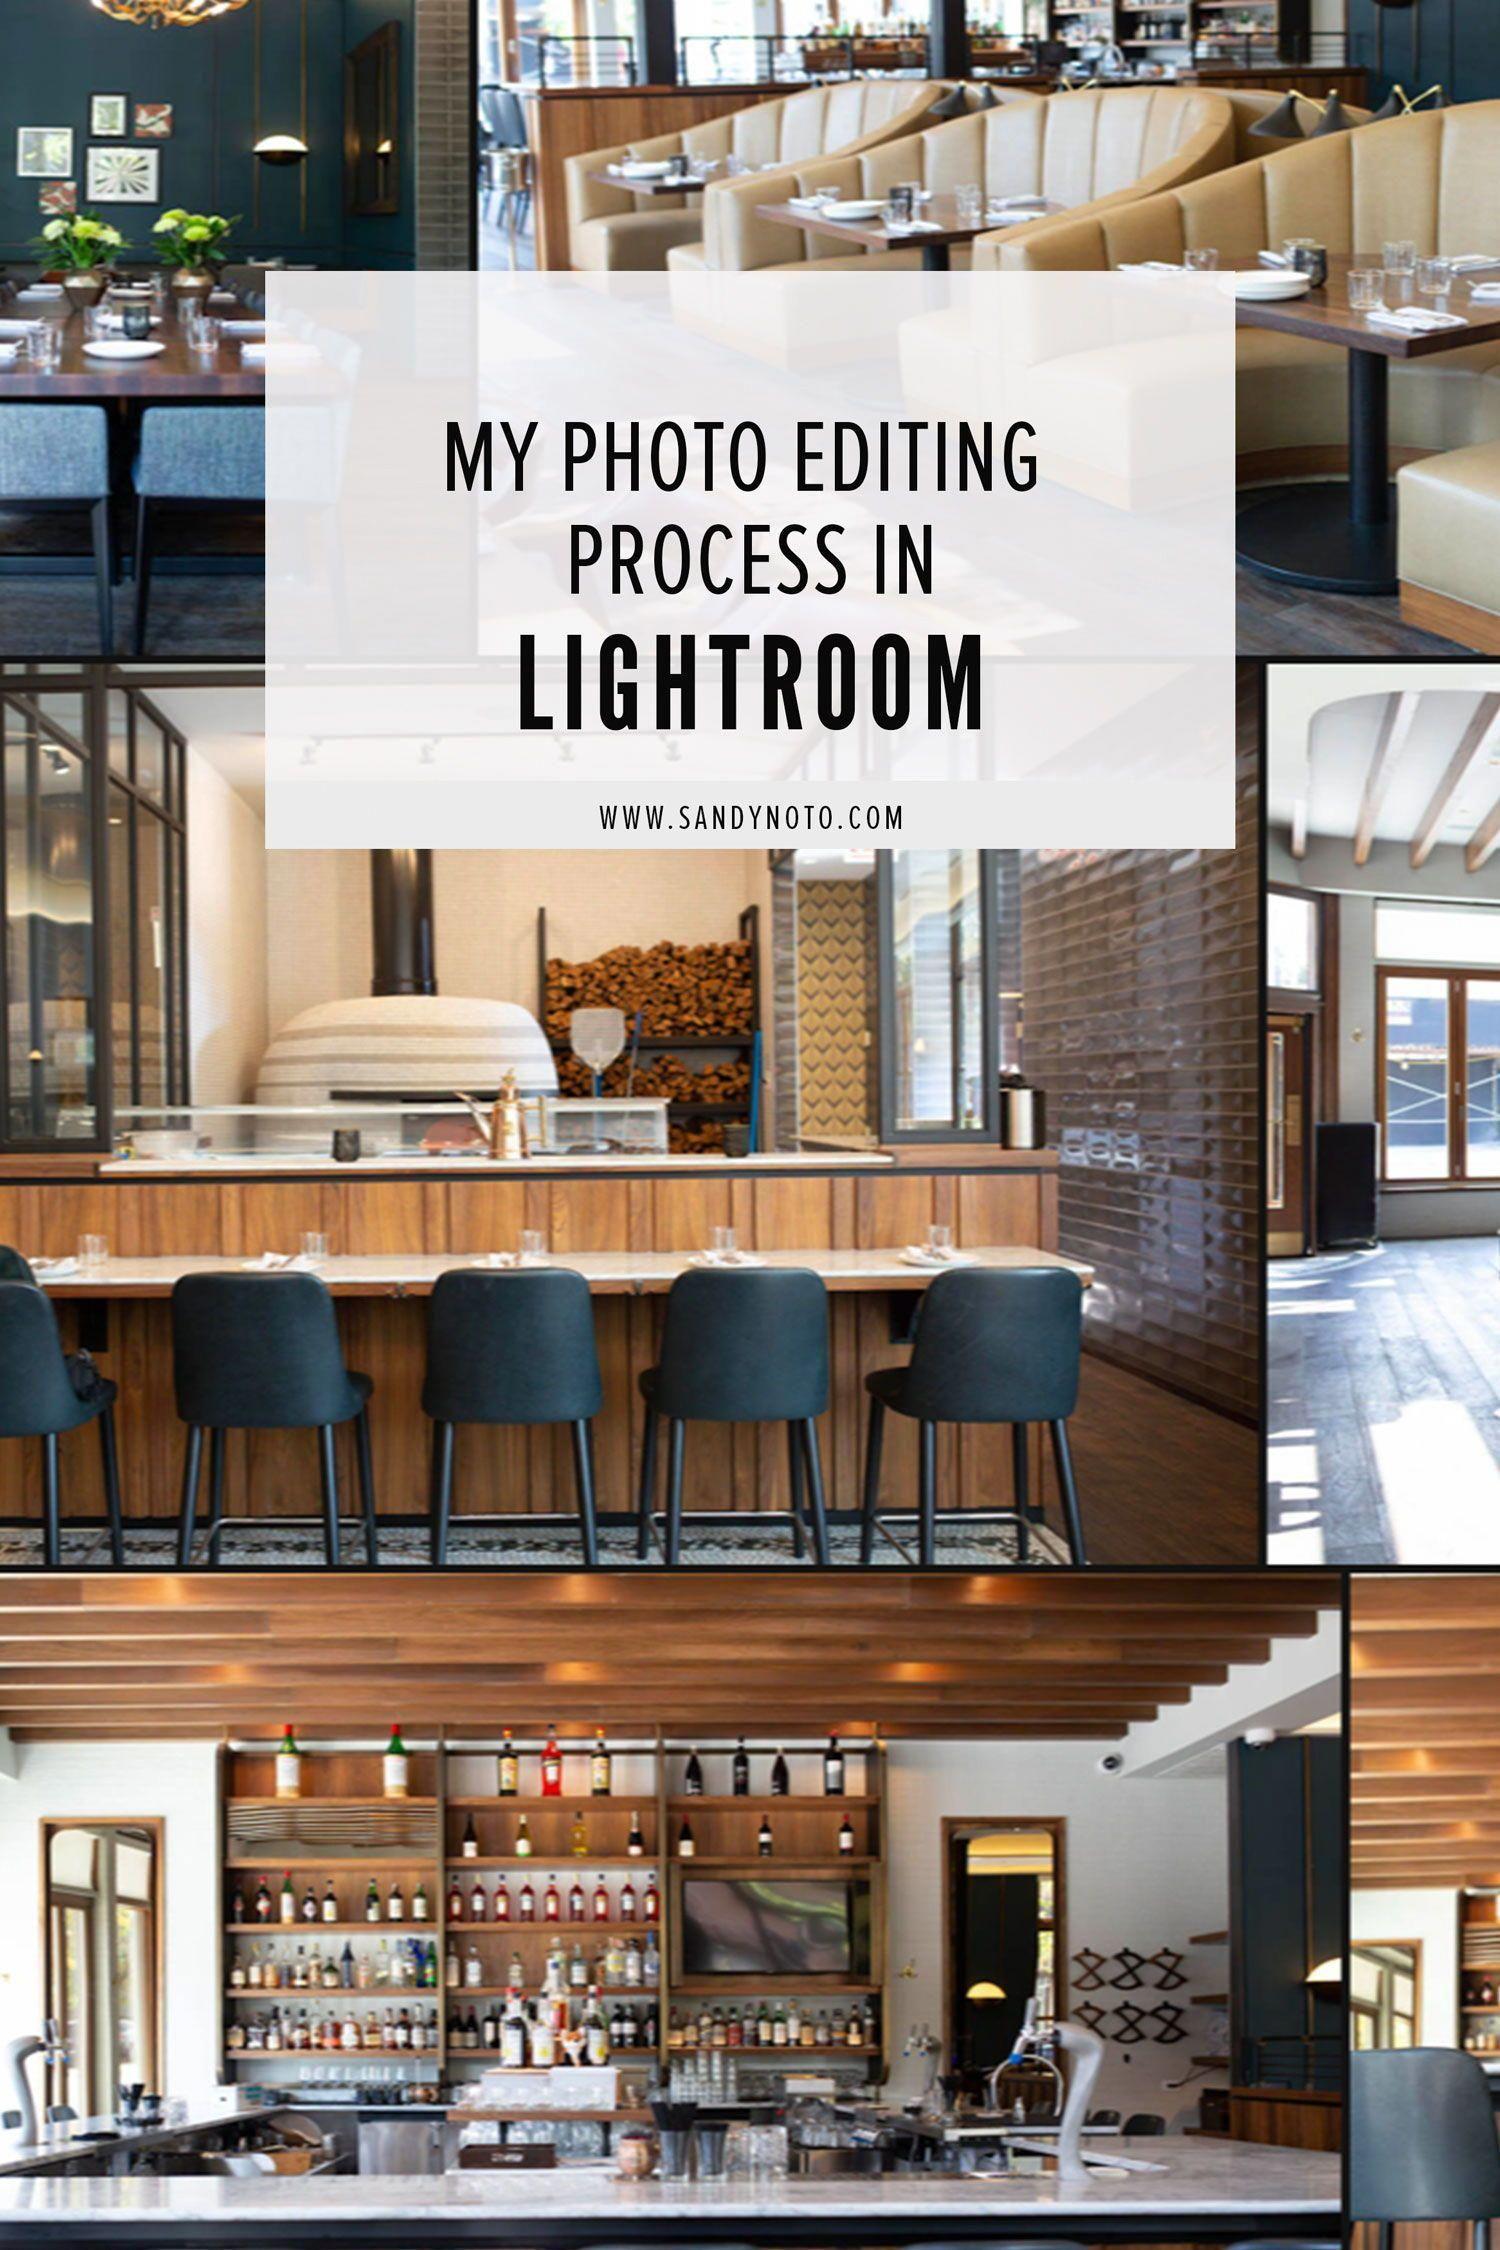 My photo editing process in Lightroom | Photo editing ...